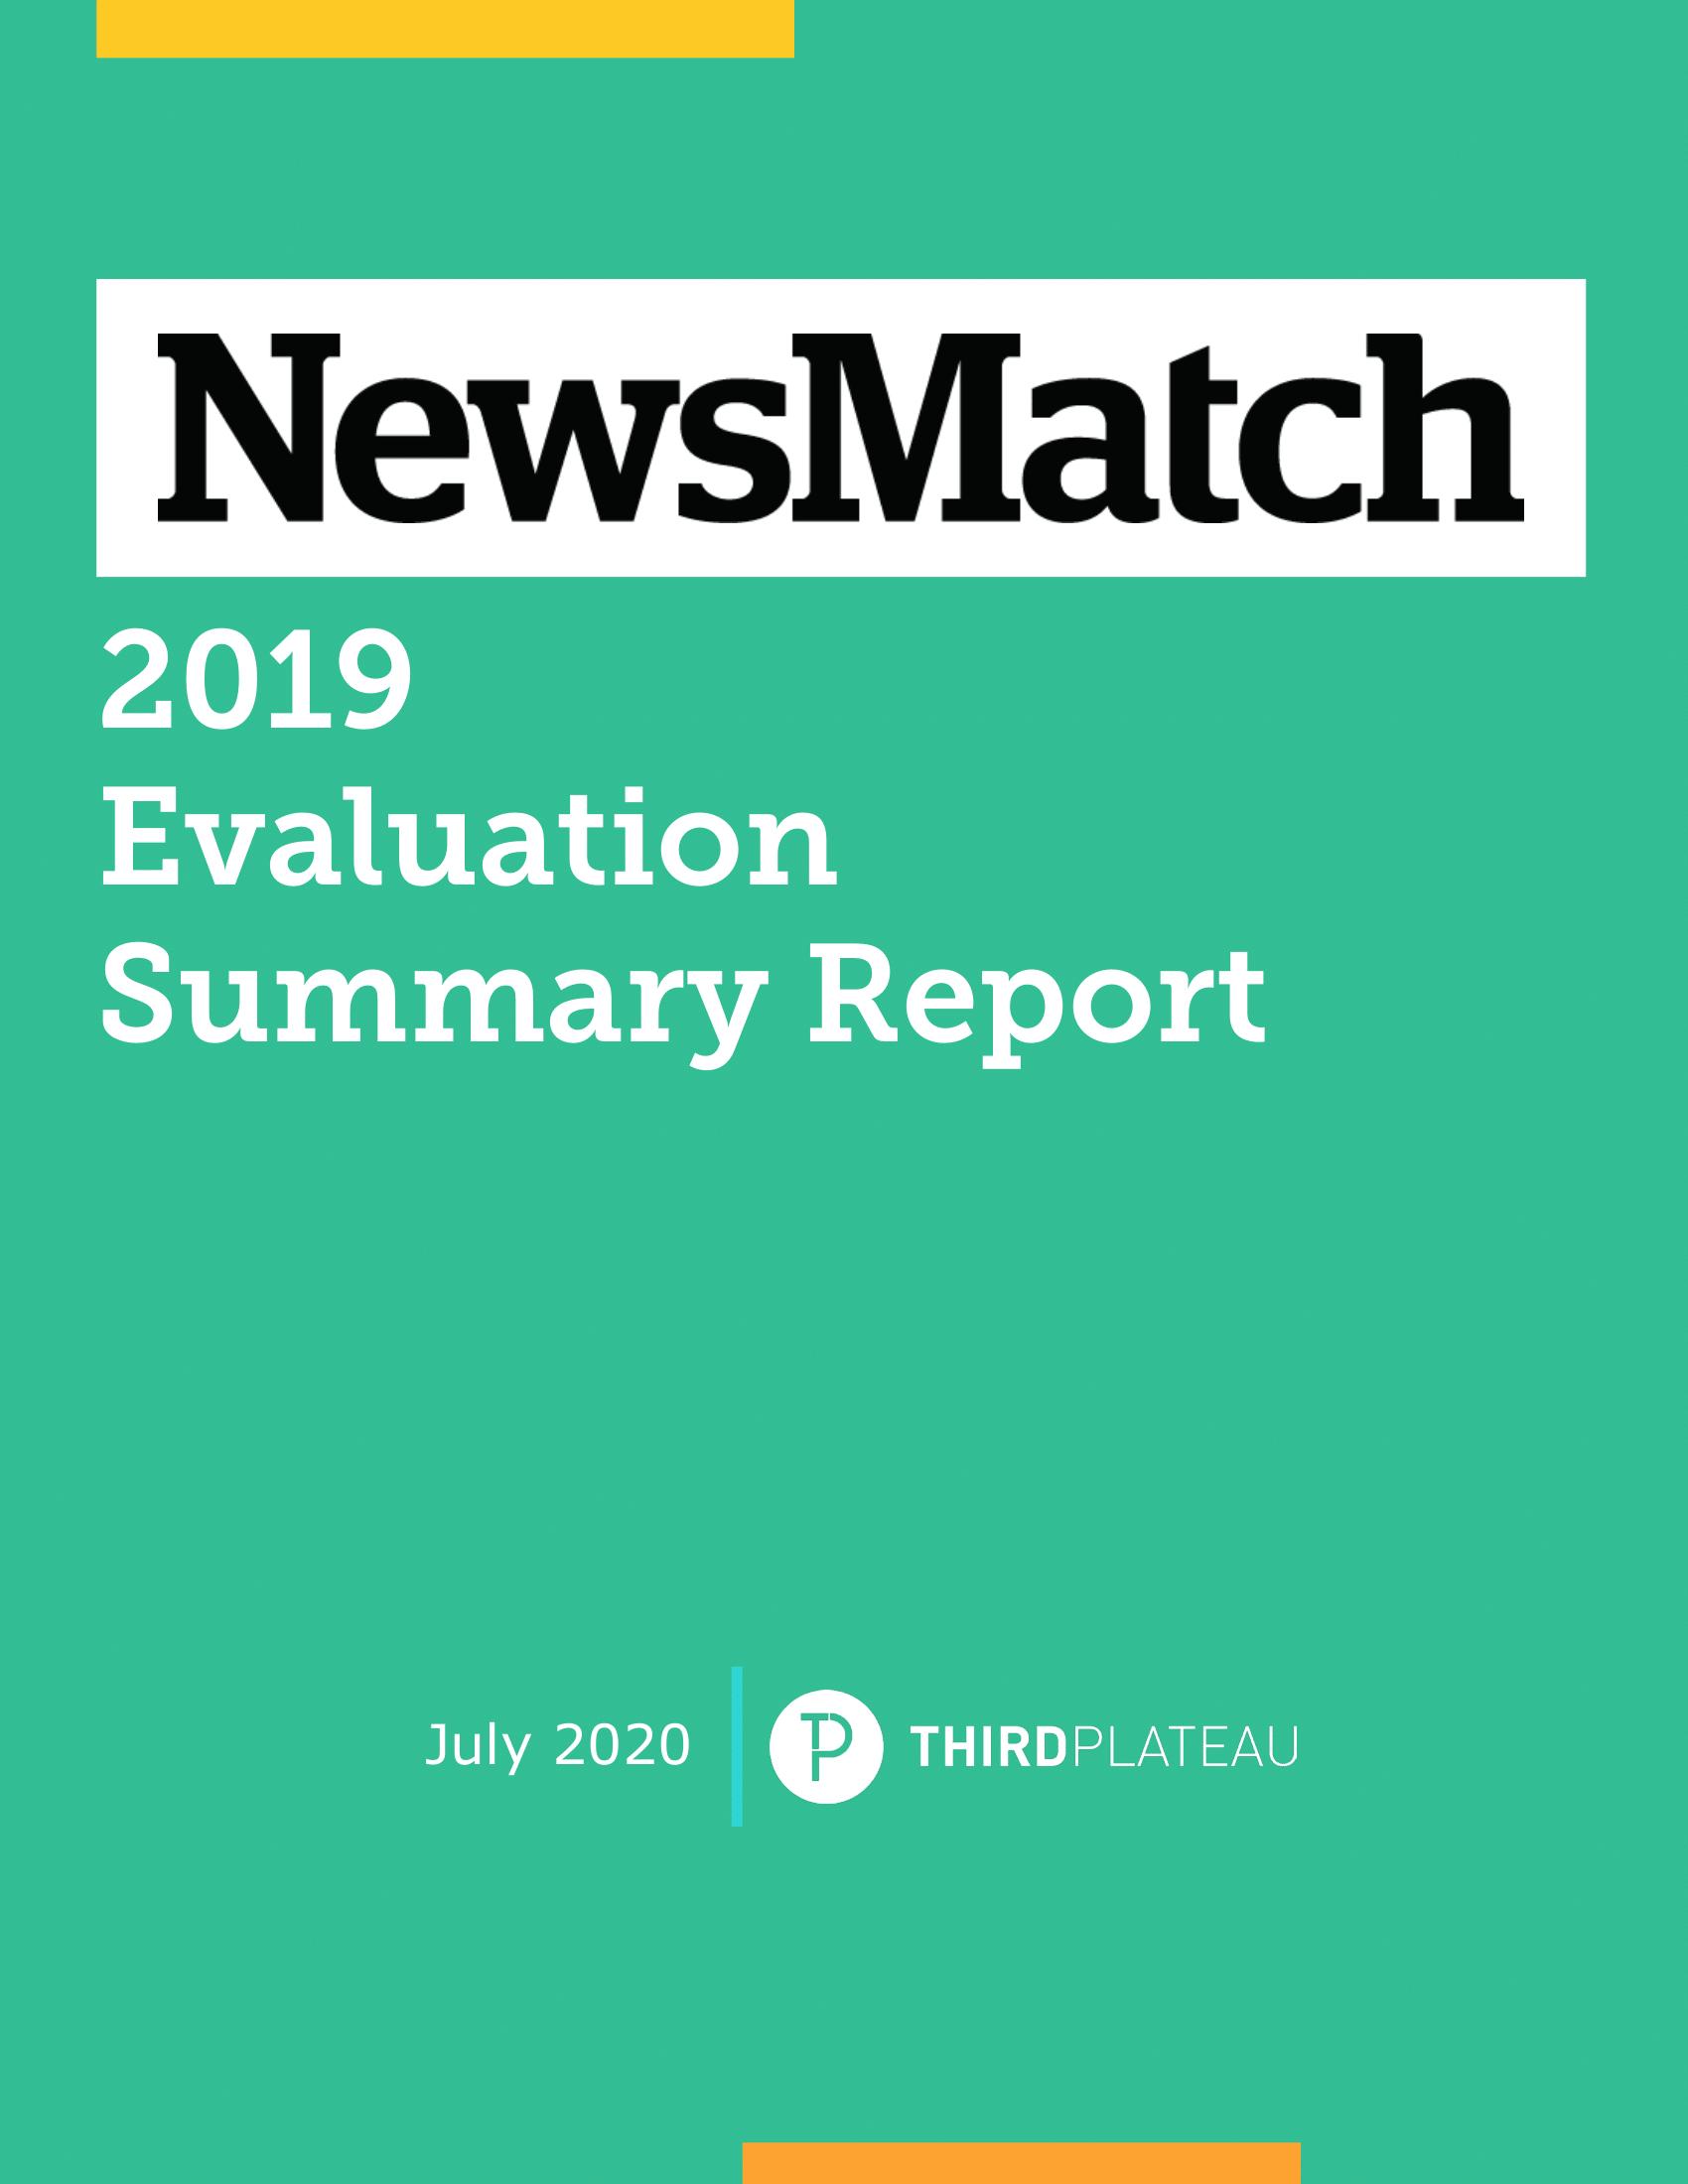 NewsMatch 2019 Evaluation Summary Report